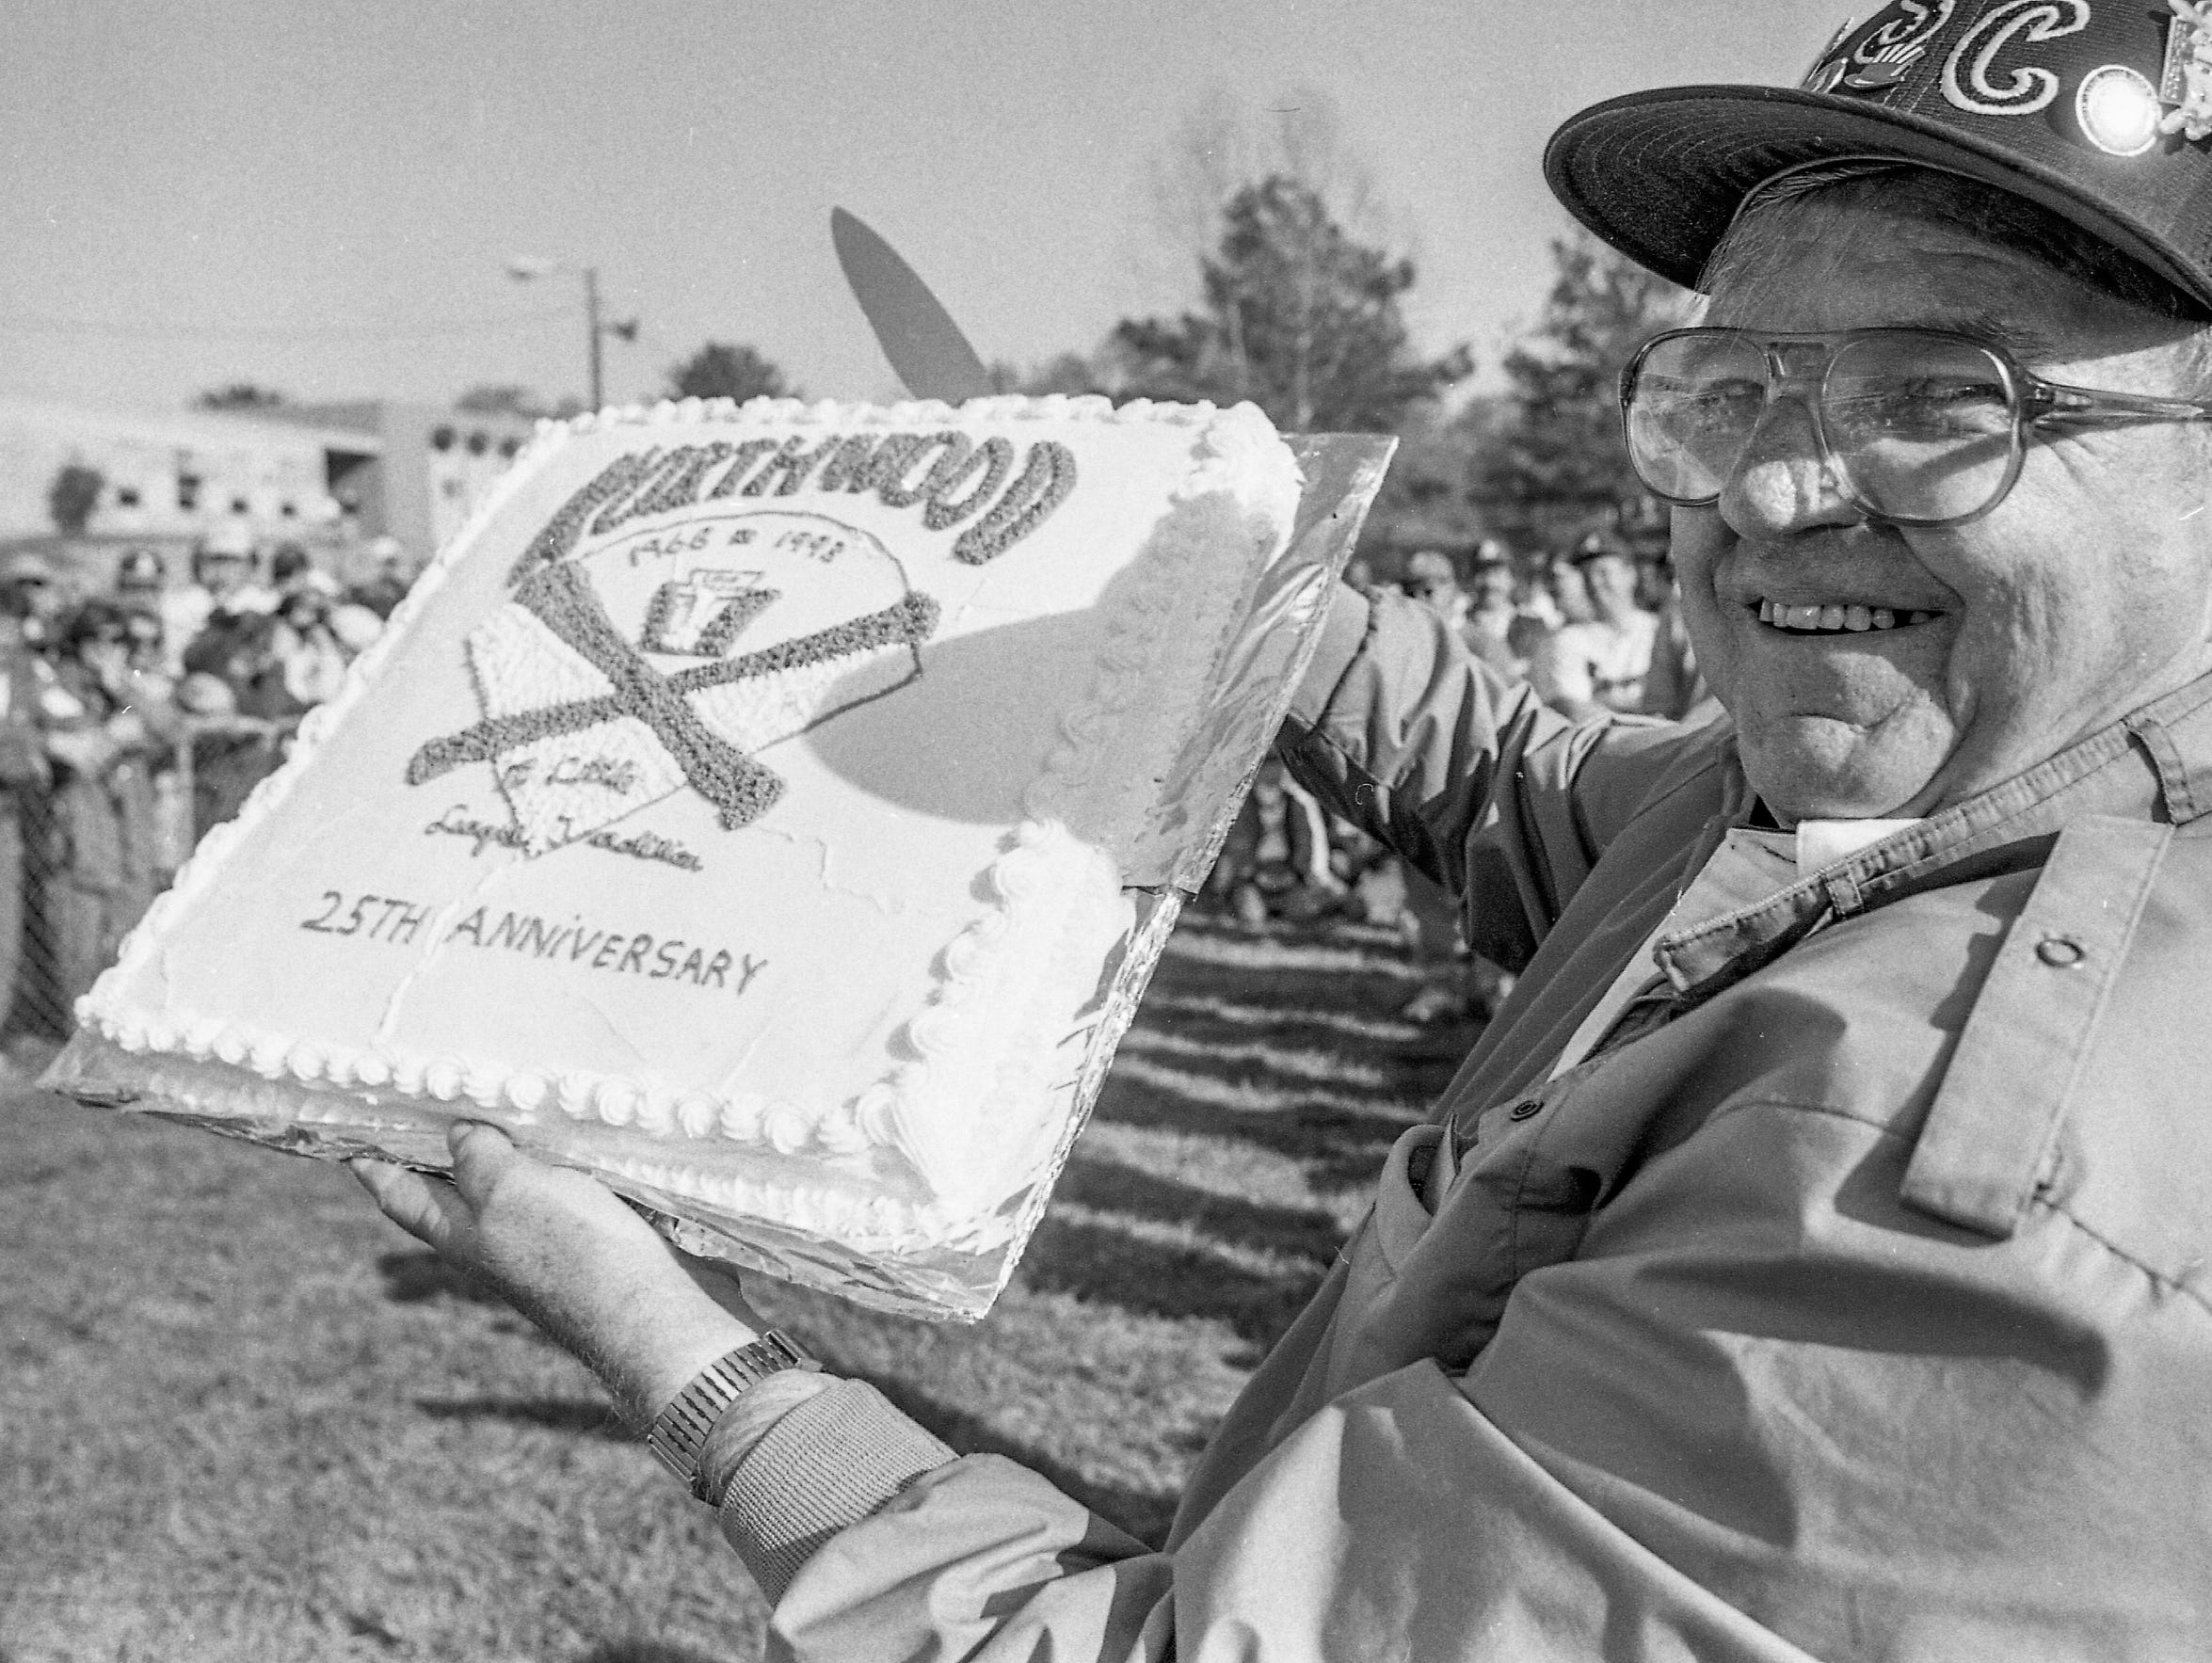 Northwood Little League founder Bob Tillison displays